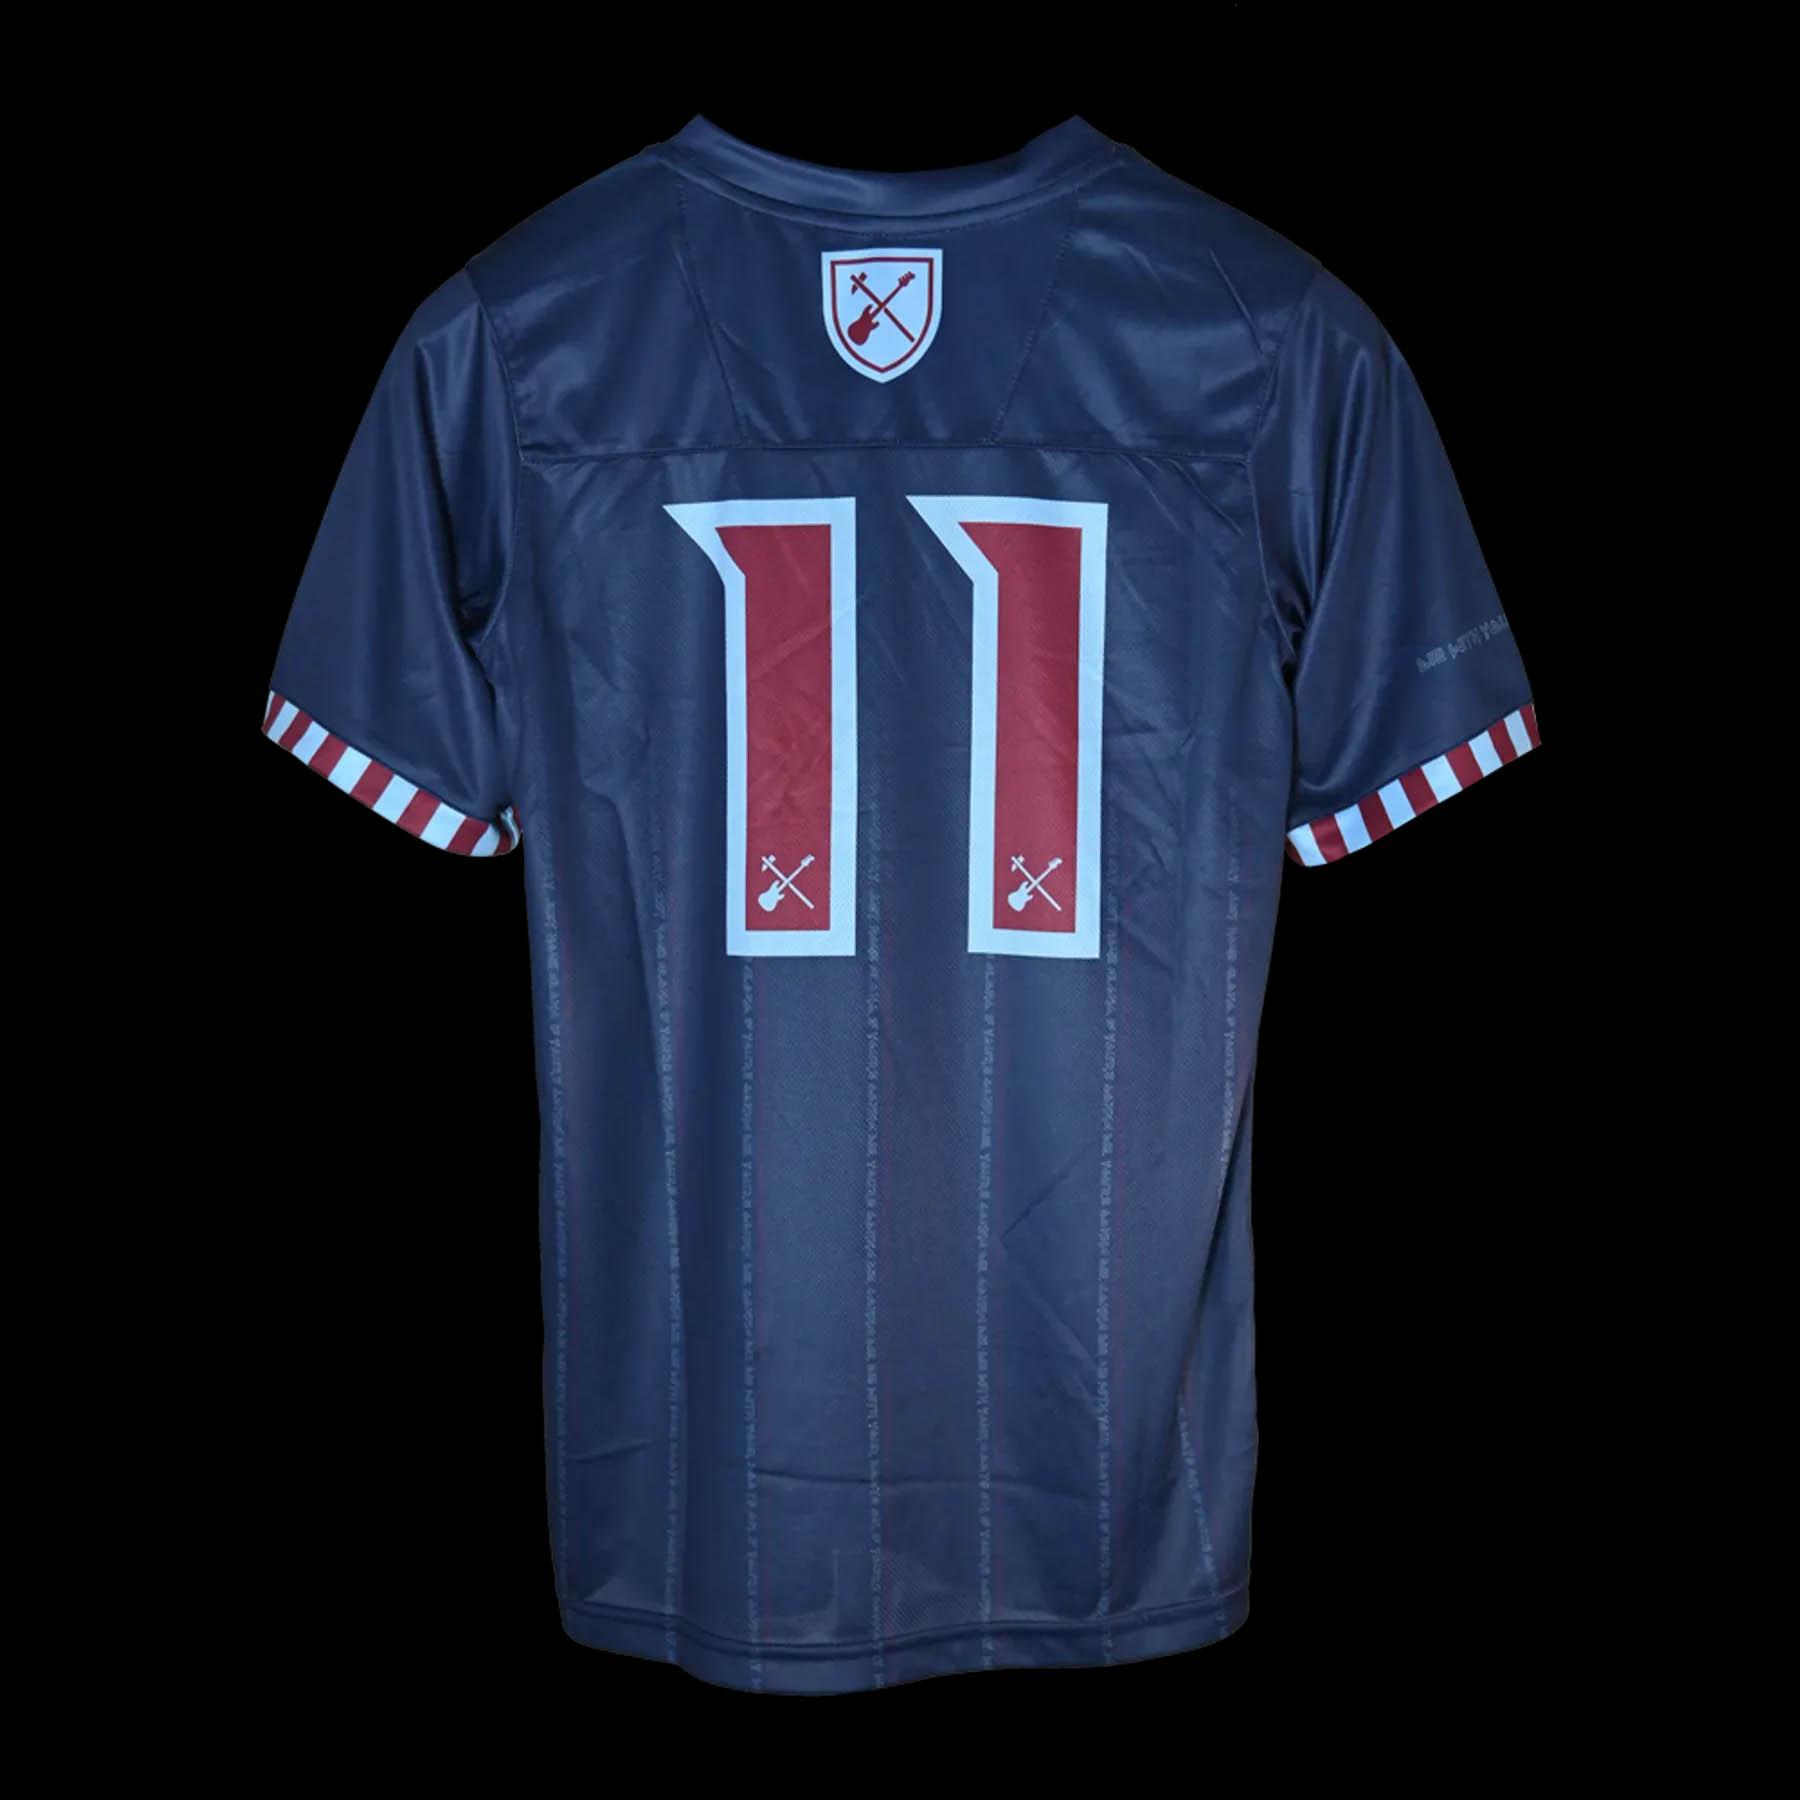 Camisa Iron Maiden x West Ham Away 2021-2022 kit